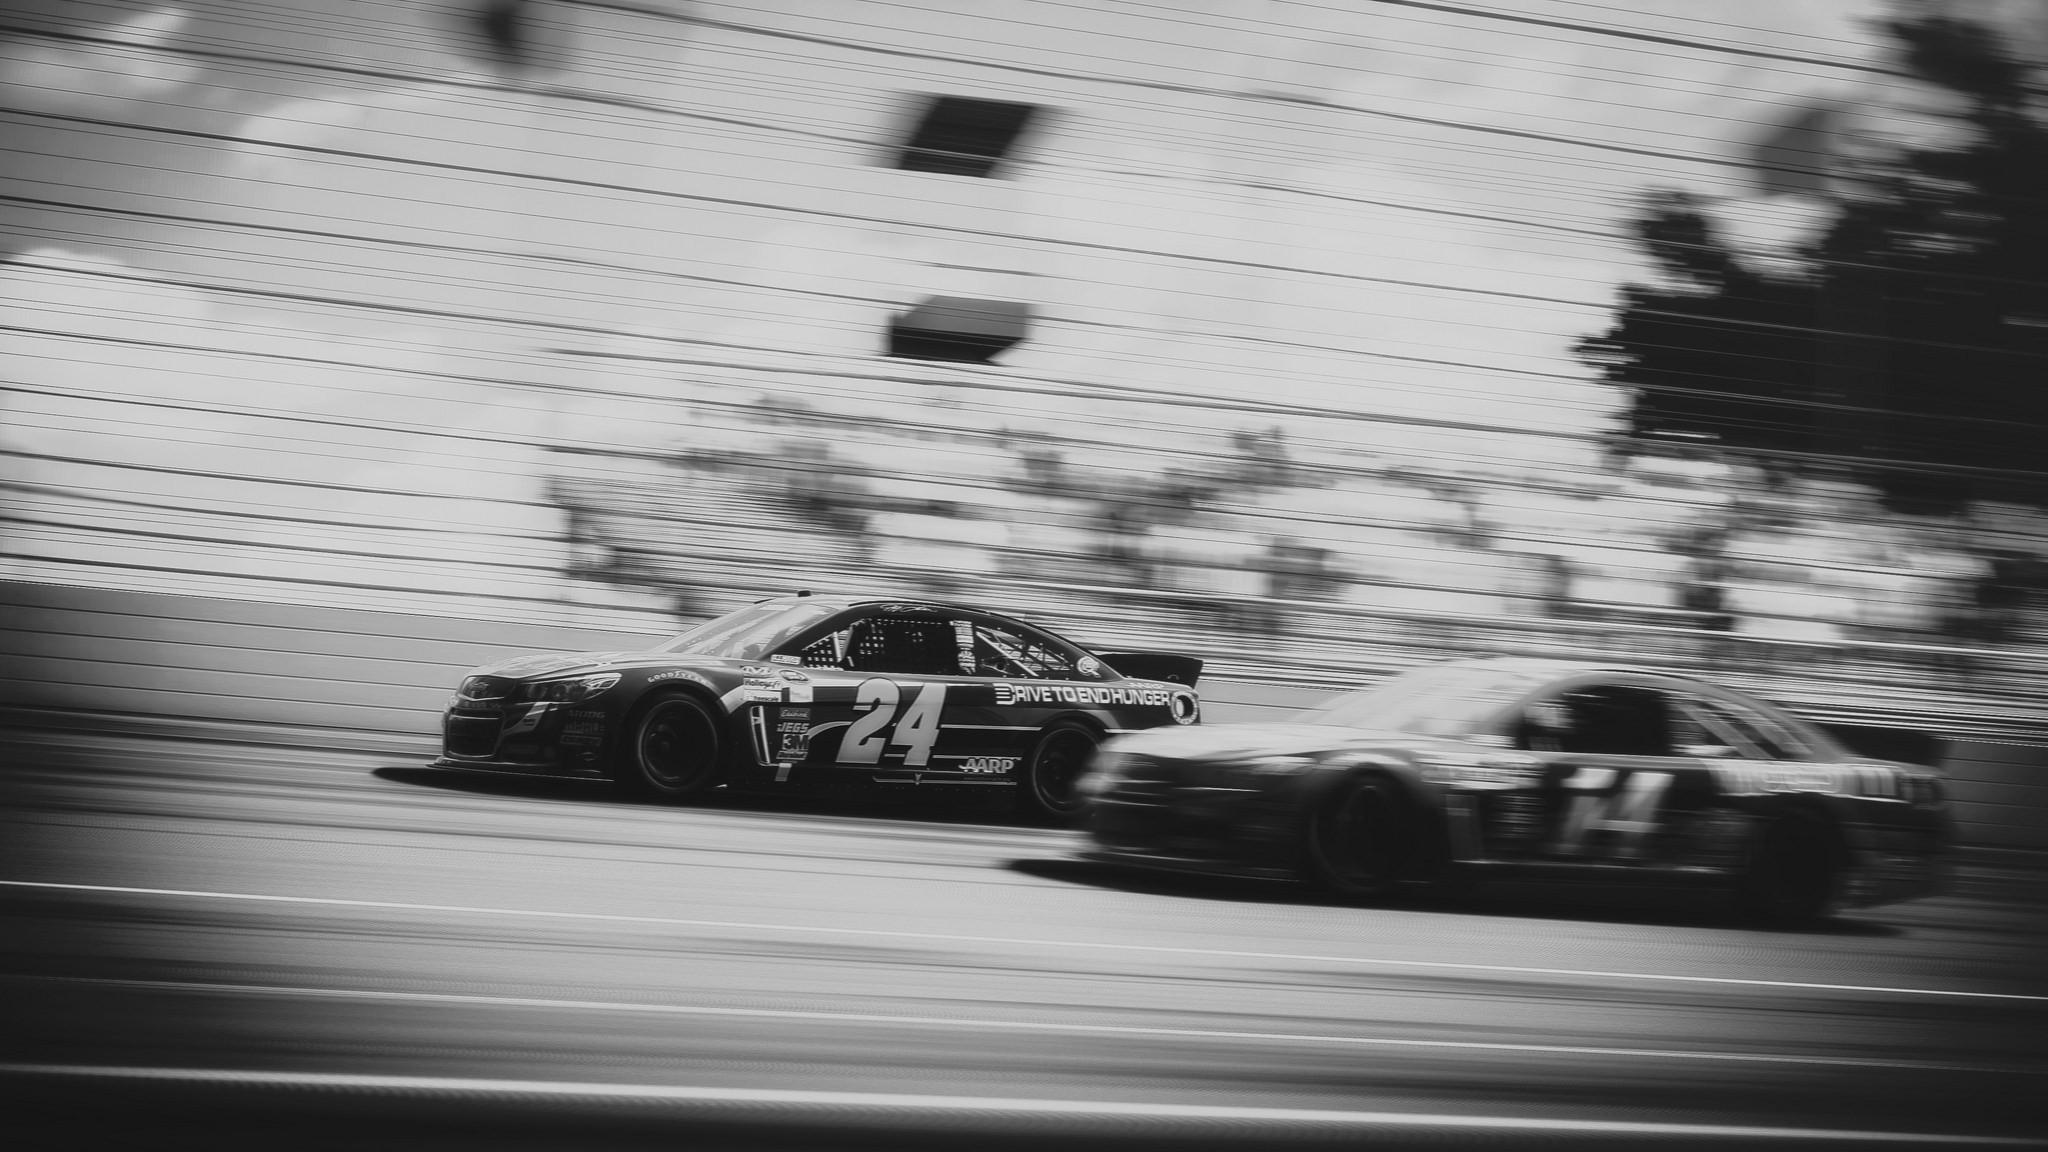 General 2048x1152 car race cars Nascar